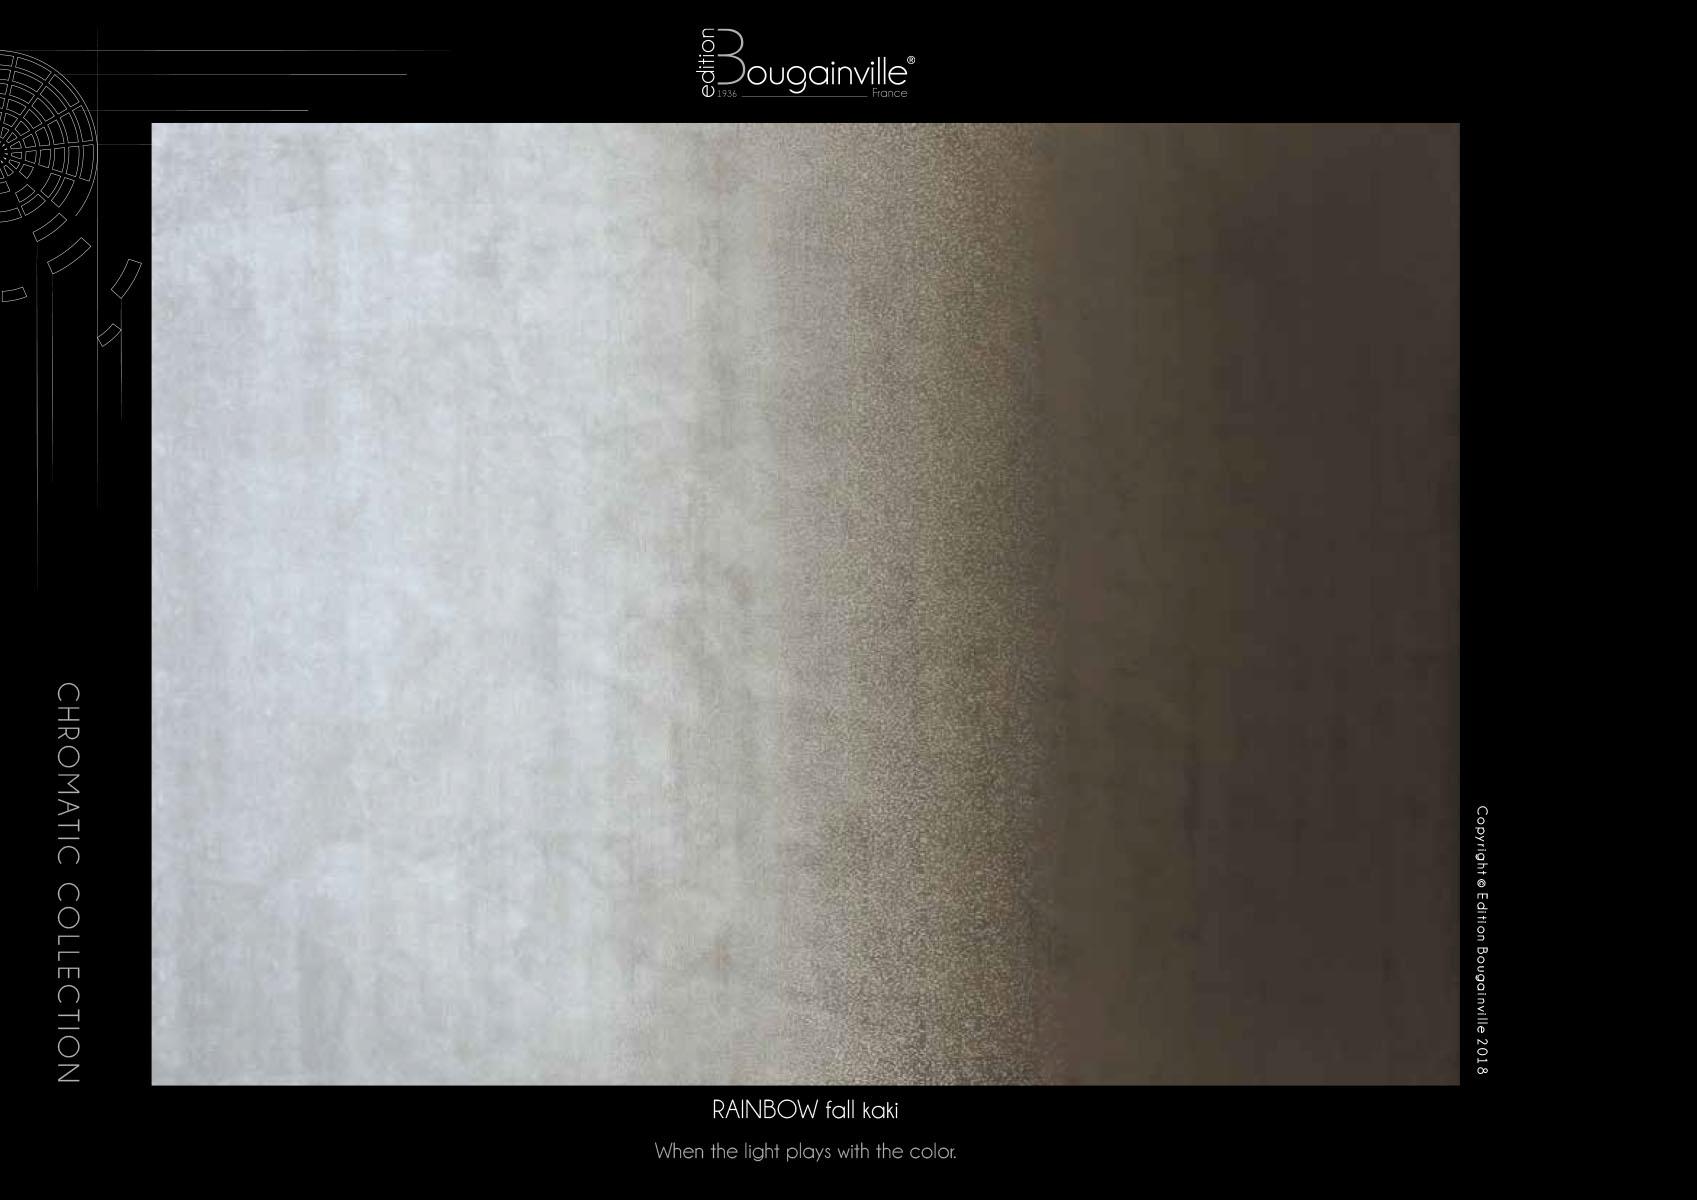 Ковер Edition Bougainville, RAINBOW fall kaki